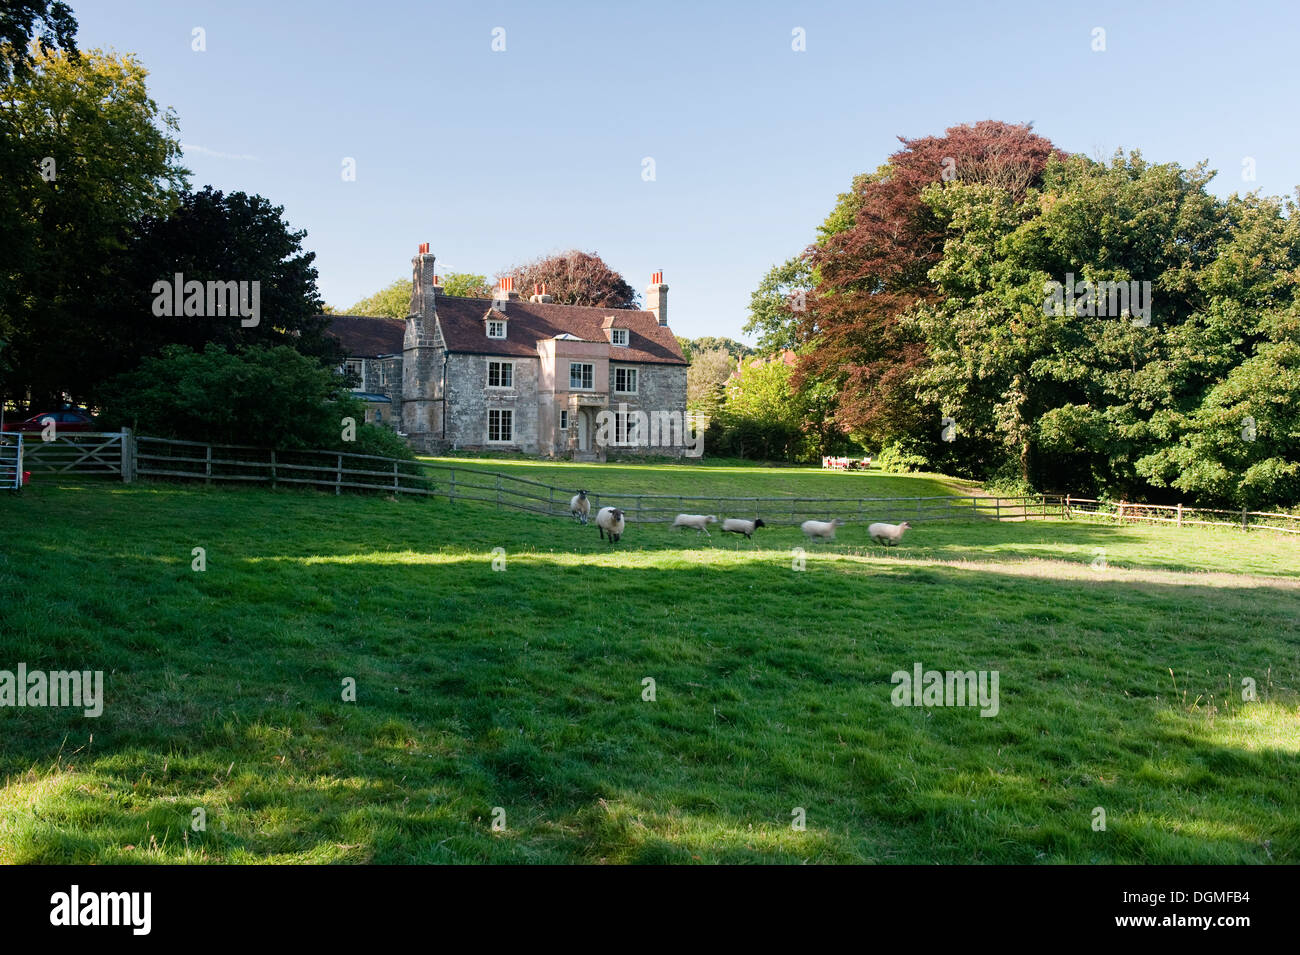 17th century house on the English south coast - Stock Image